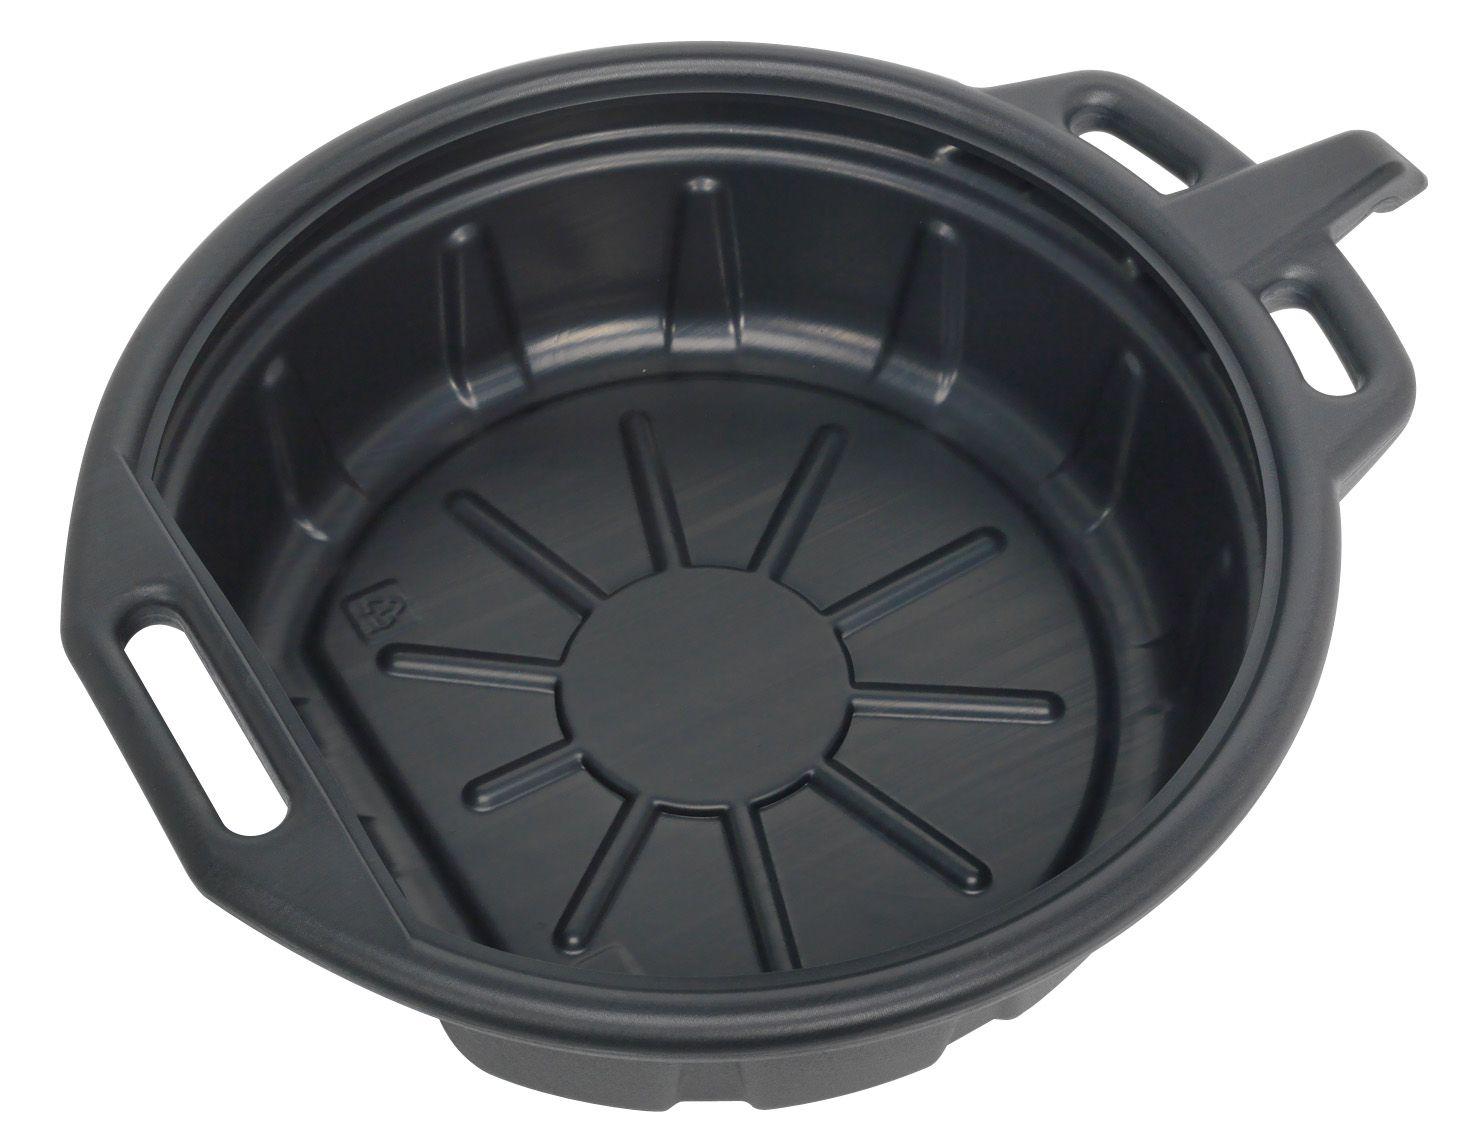 Sealey Oil/Fluid Drain Pan 17L